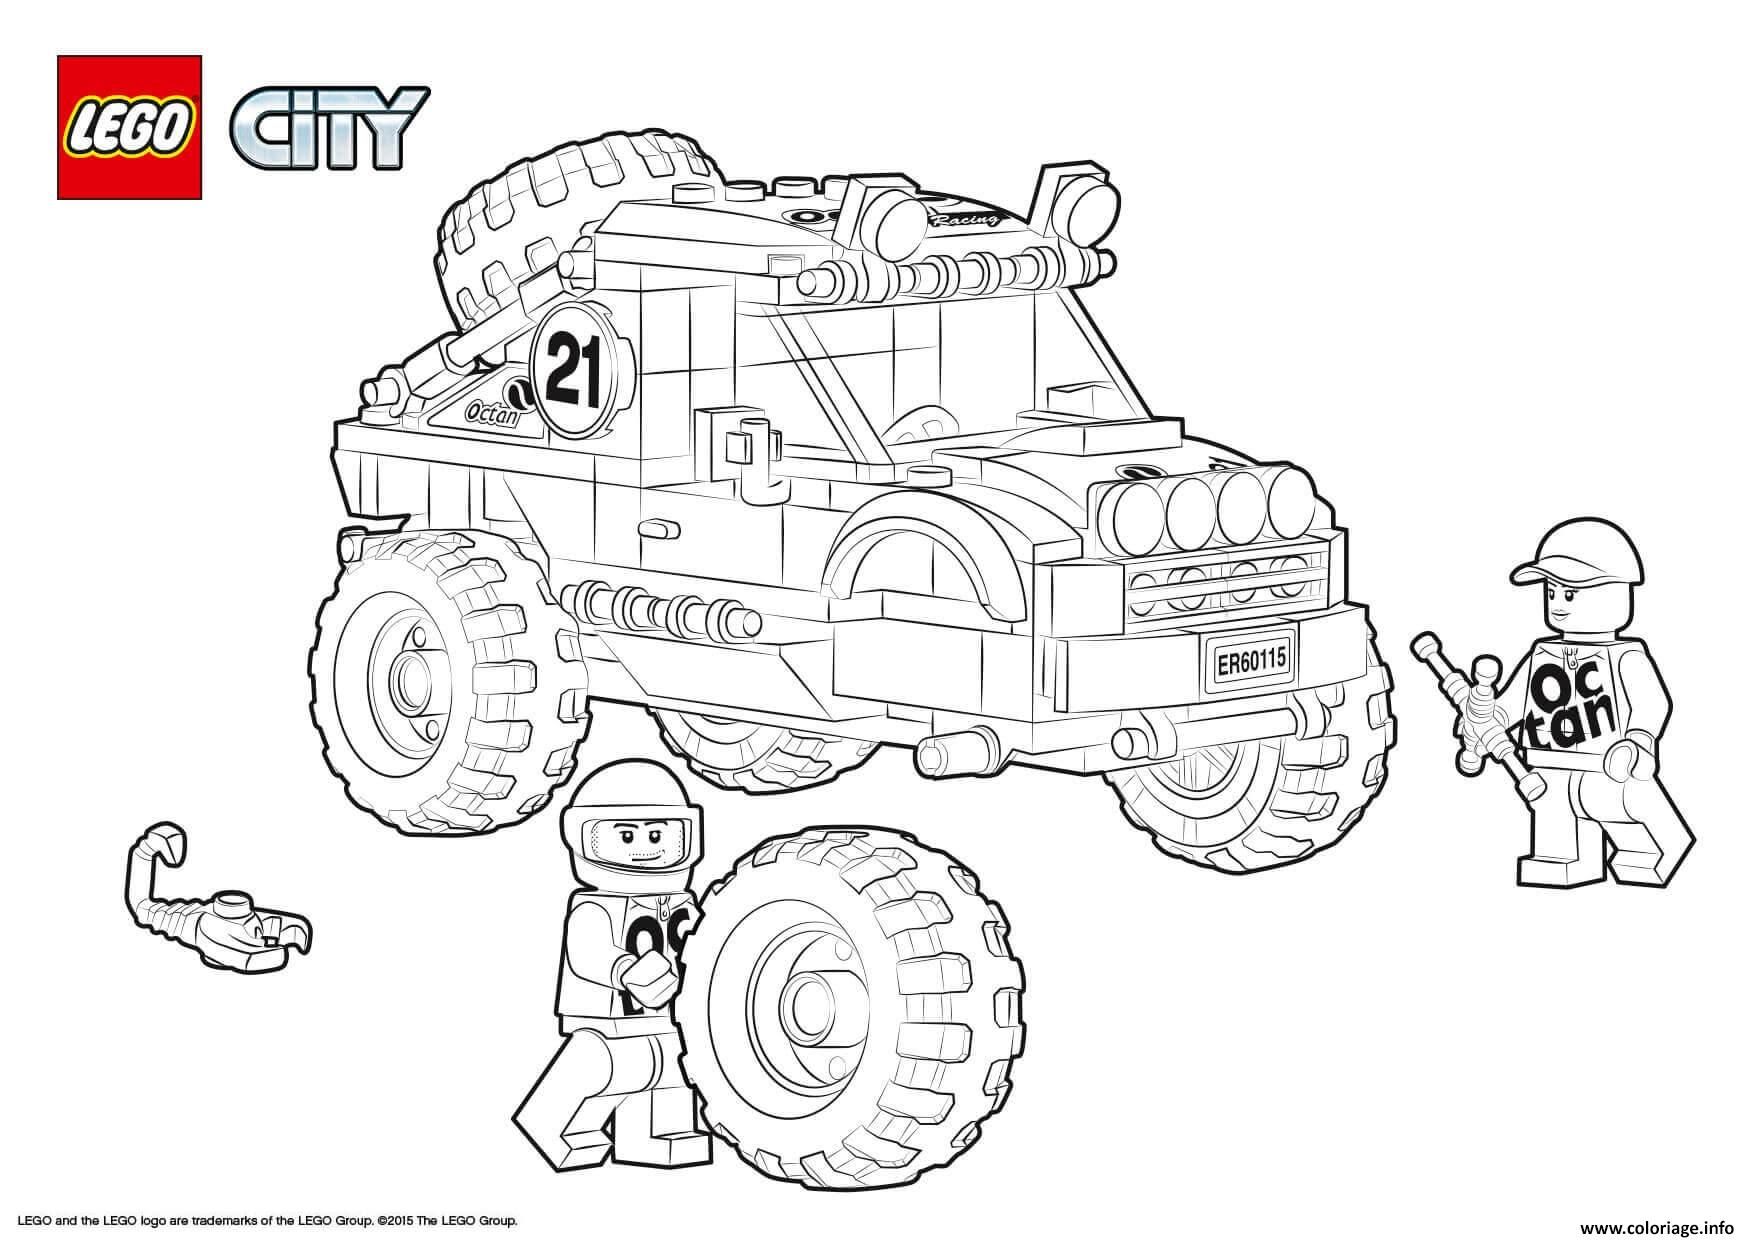 Coloriage Lego City 4x4 Off Roader dessin